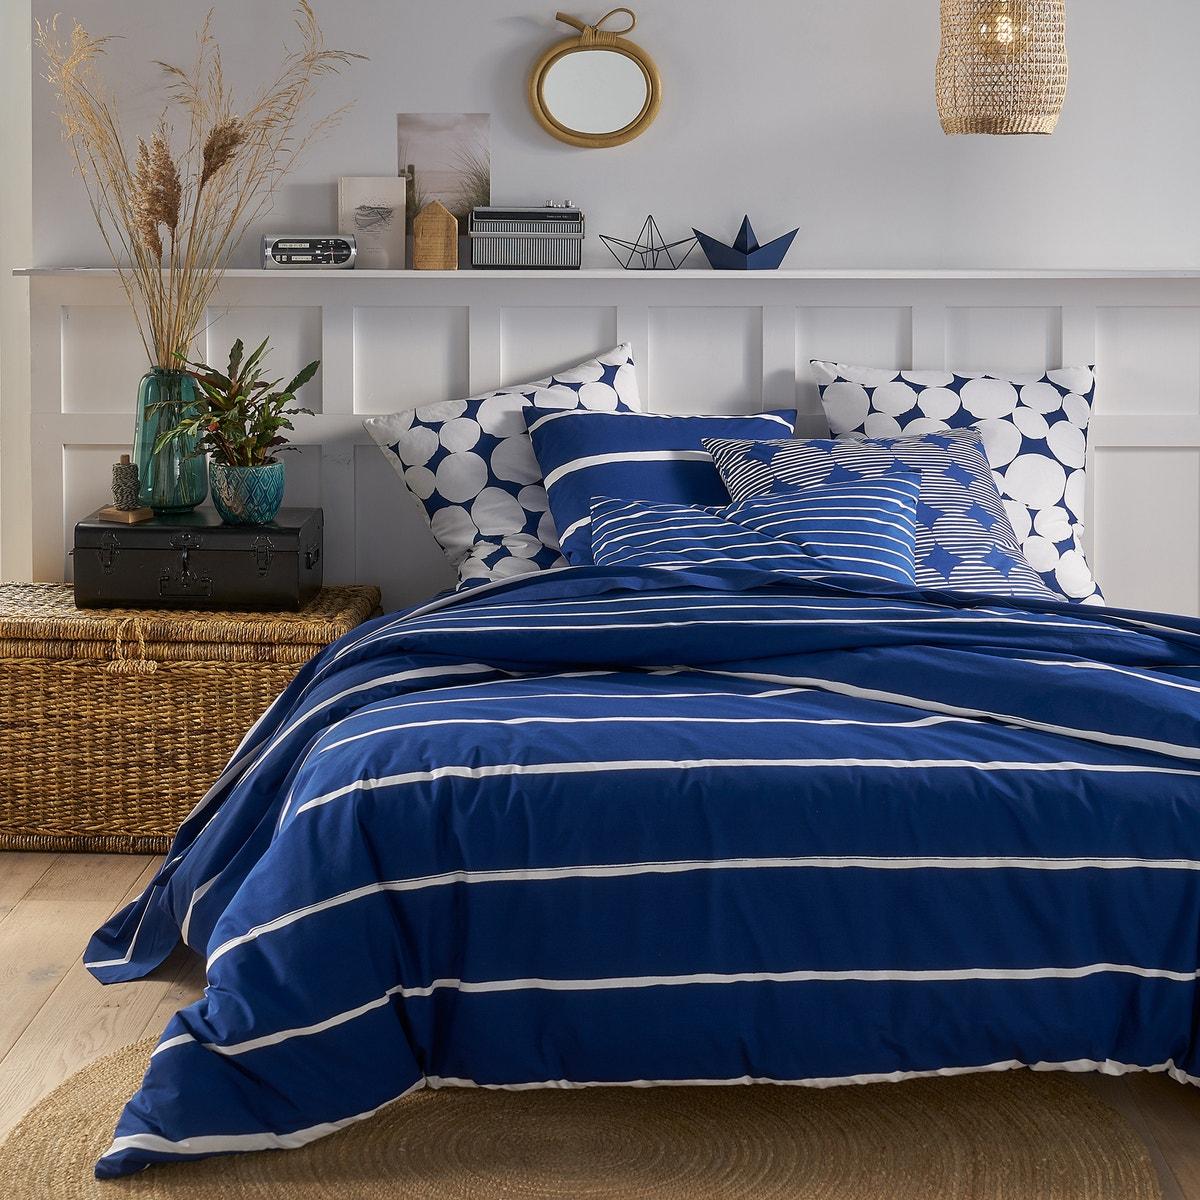 La Redoute ropa de cama